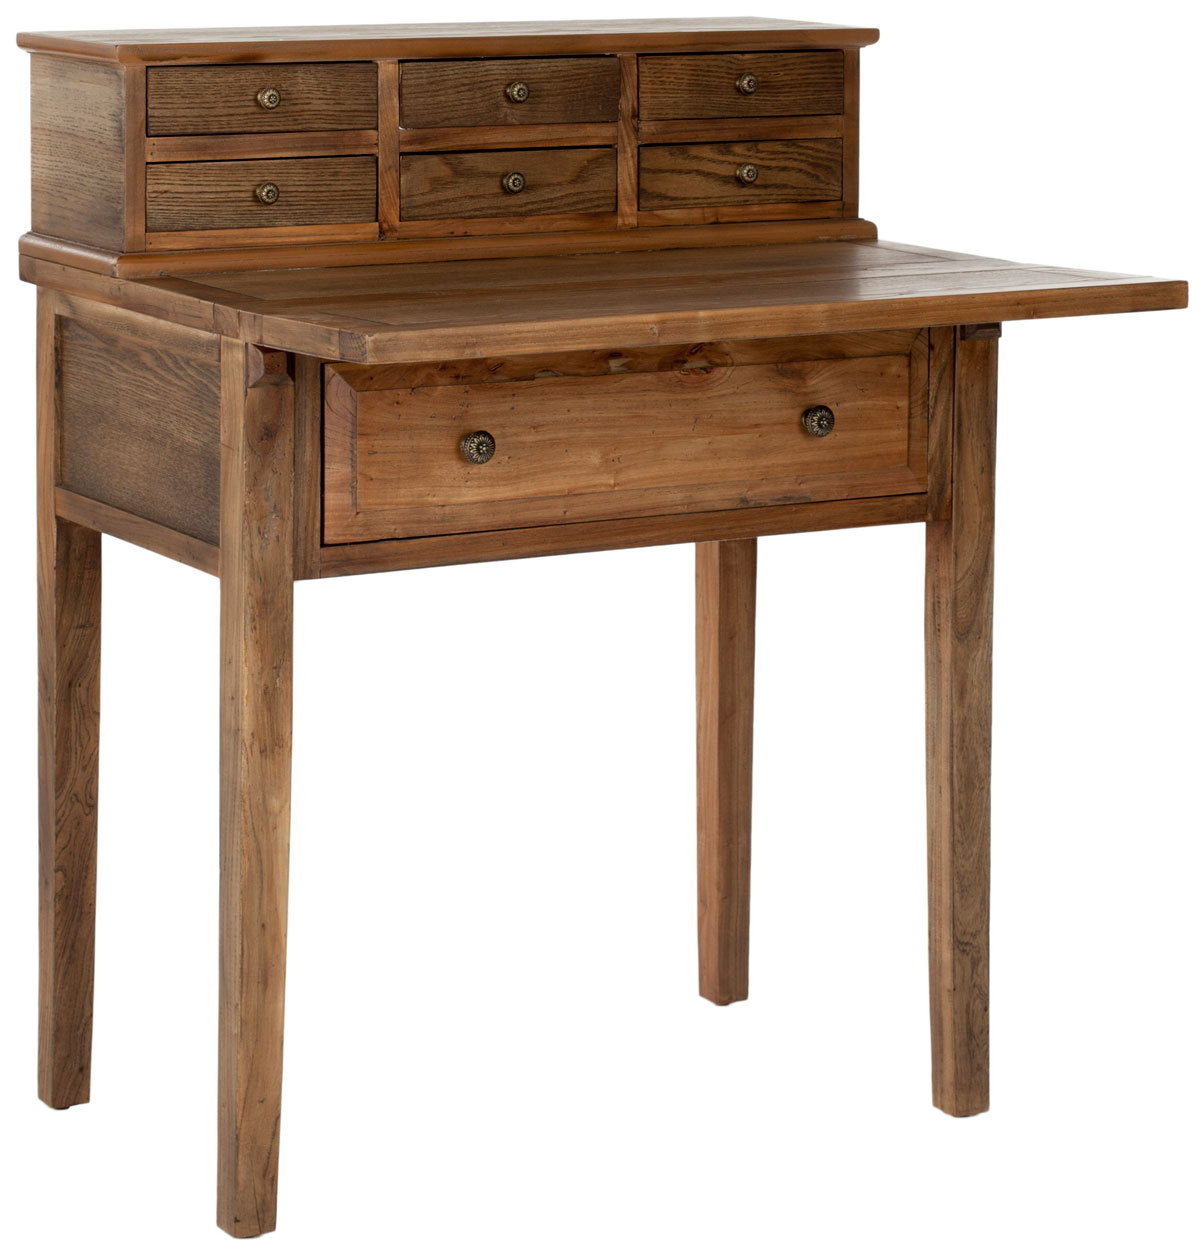 AMH6520C Desks - Furniture by Safavieh  Safavieh